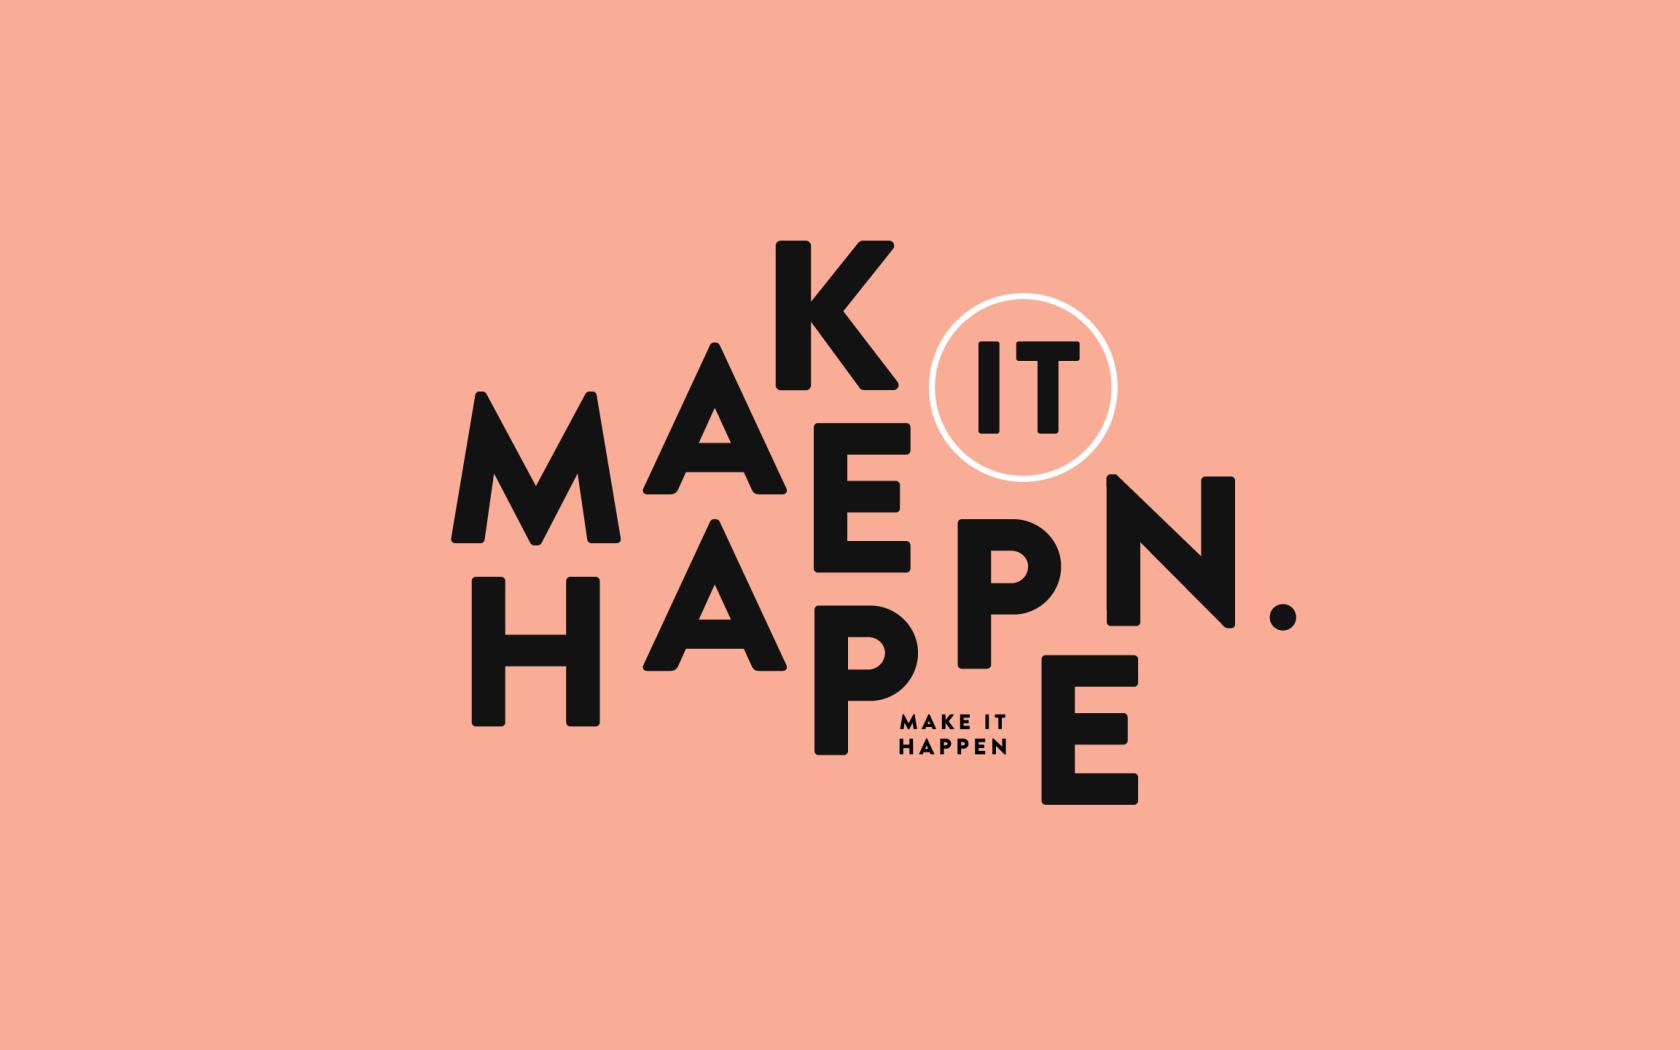 Make It Happen Minimal Full Hd 2k Wallpaper